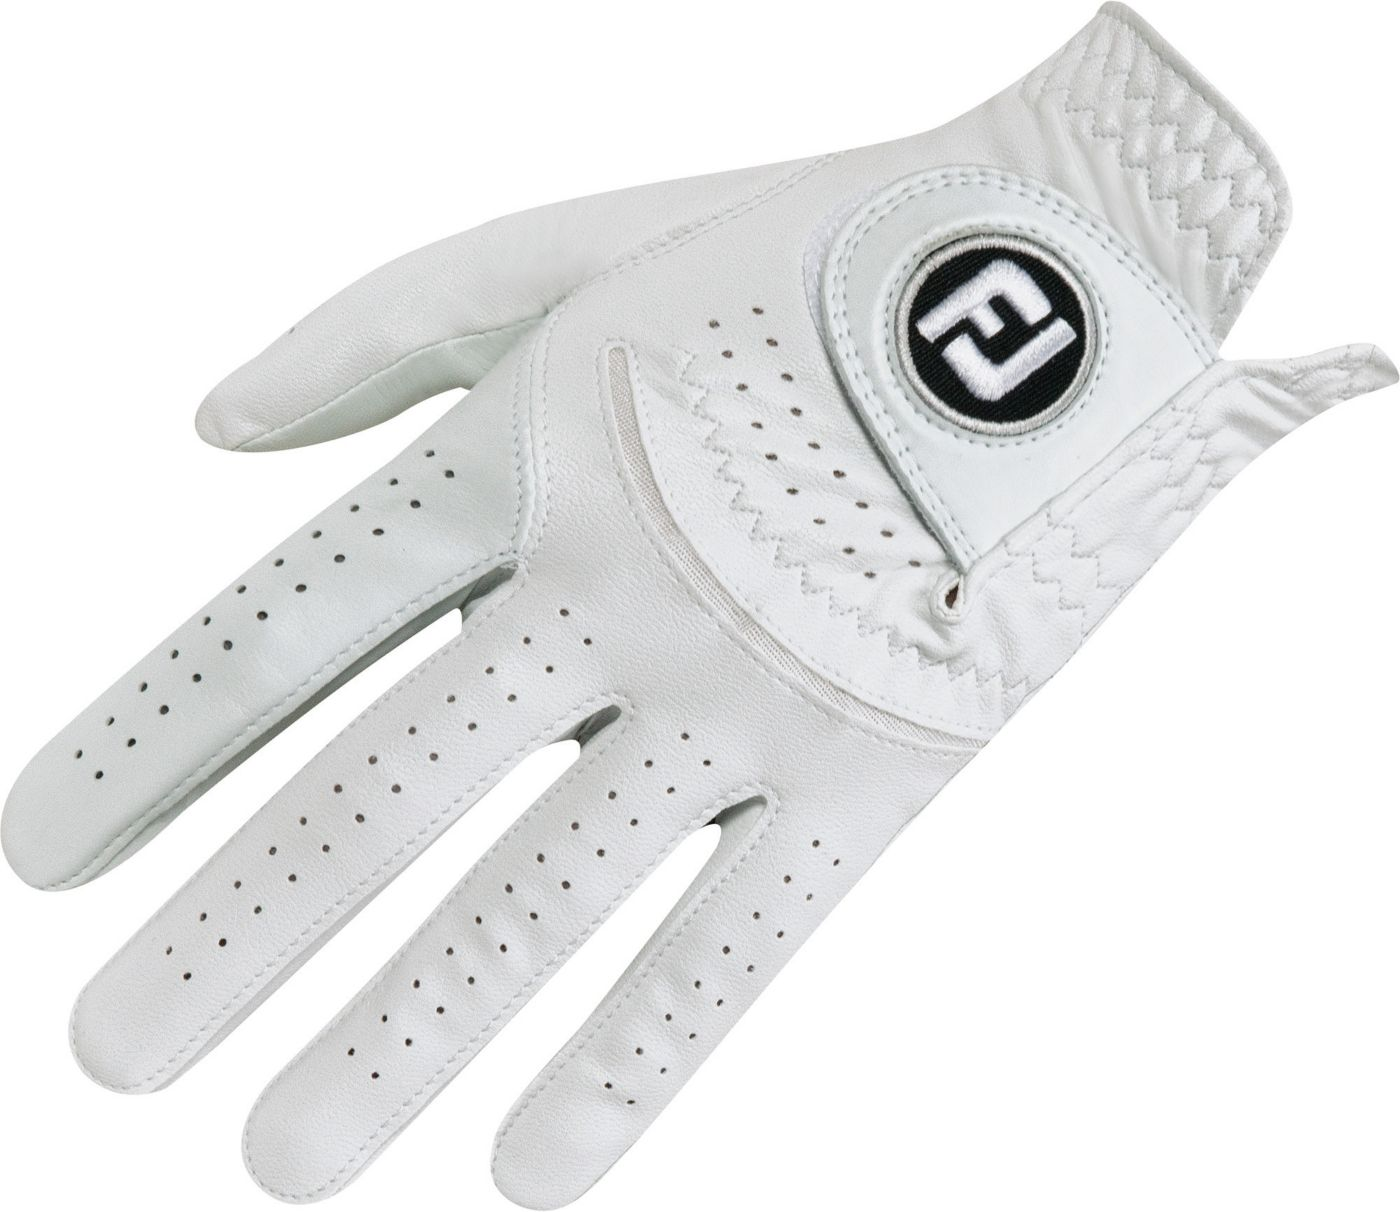 FootJoy Women's Contour FLX Golf Glove- Prior Generation